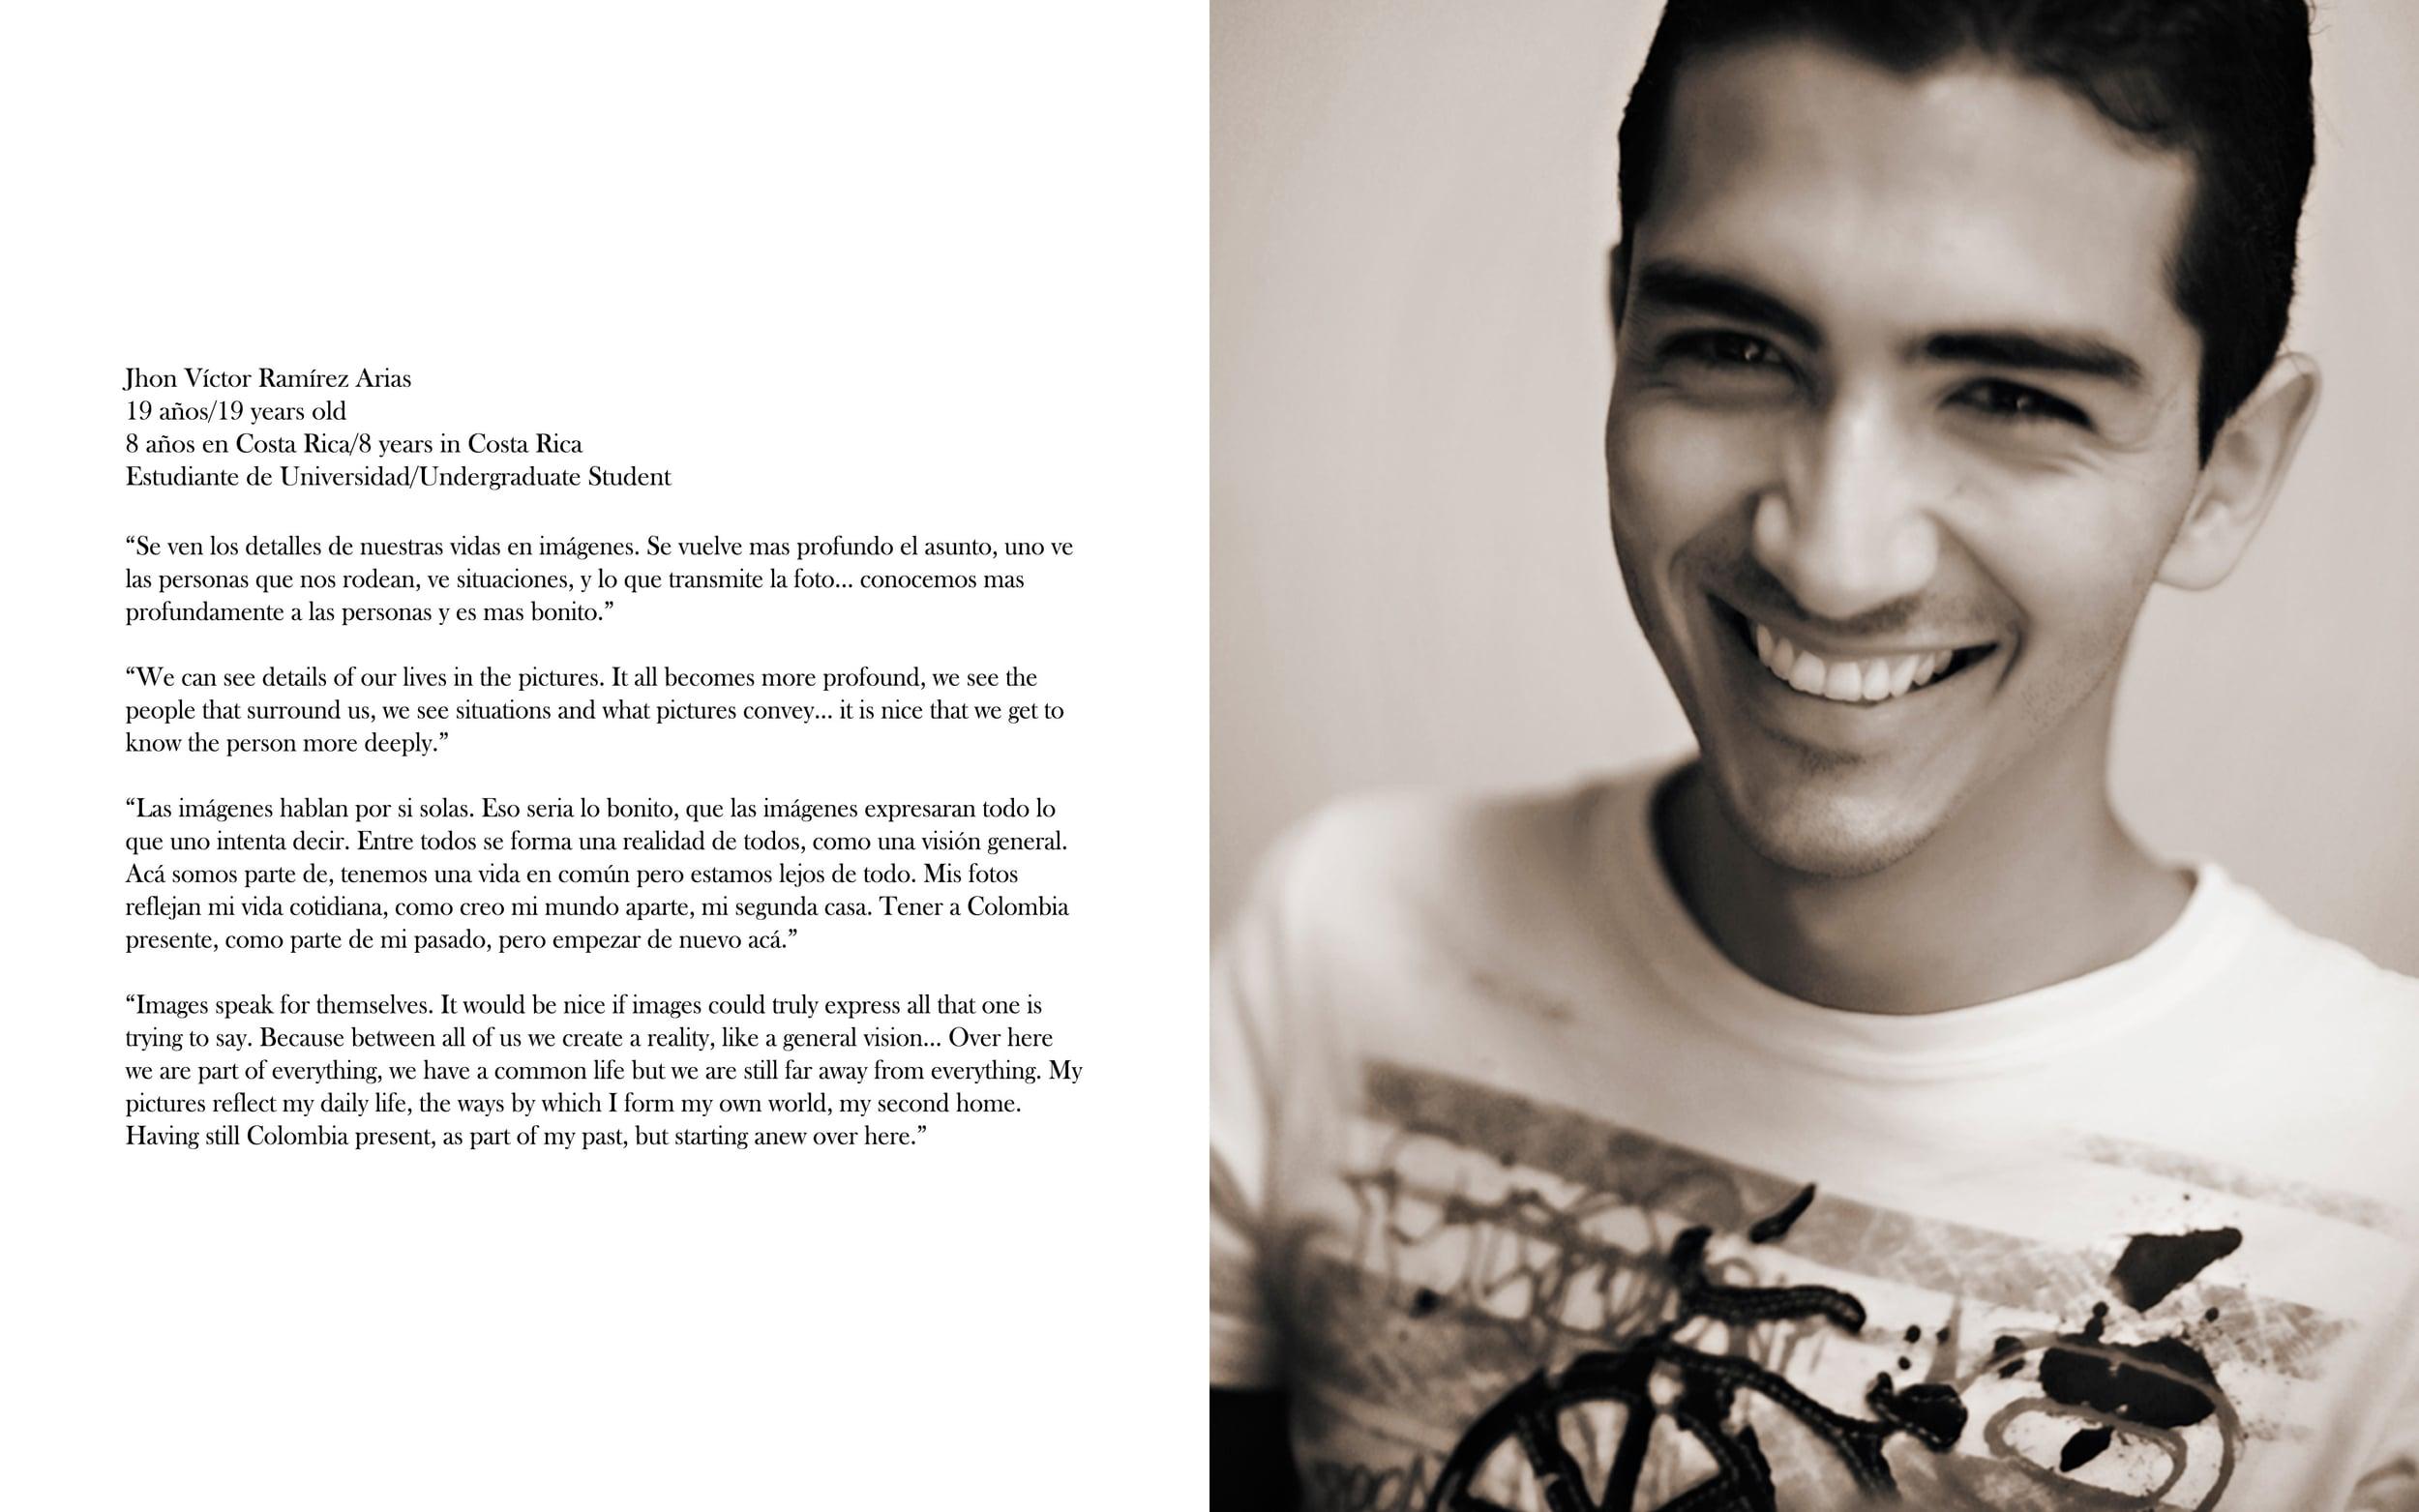 16 Jhon Victor Ramirez Arias.jpg